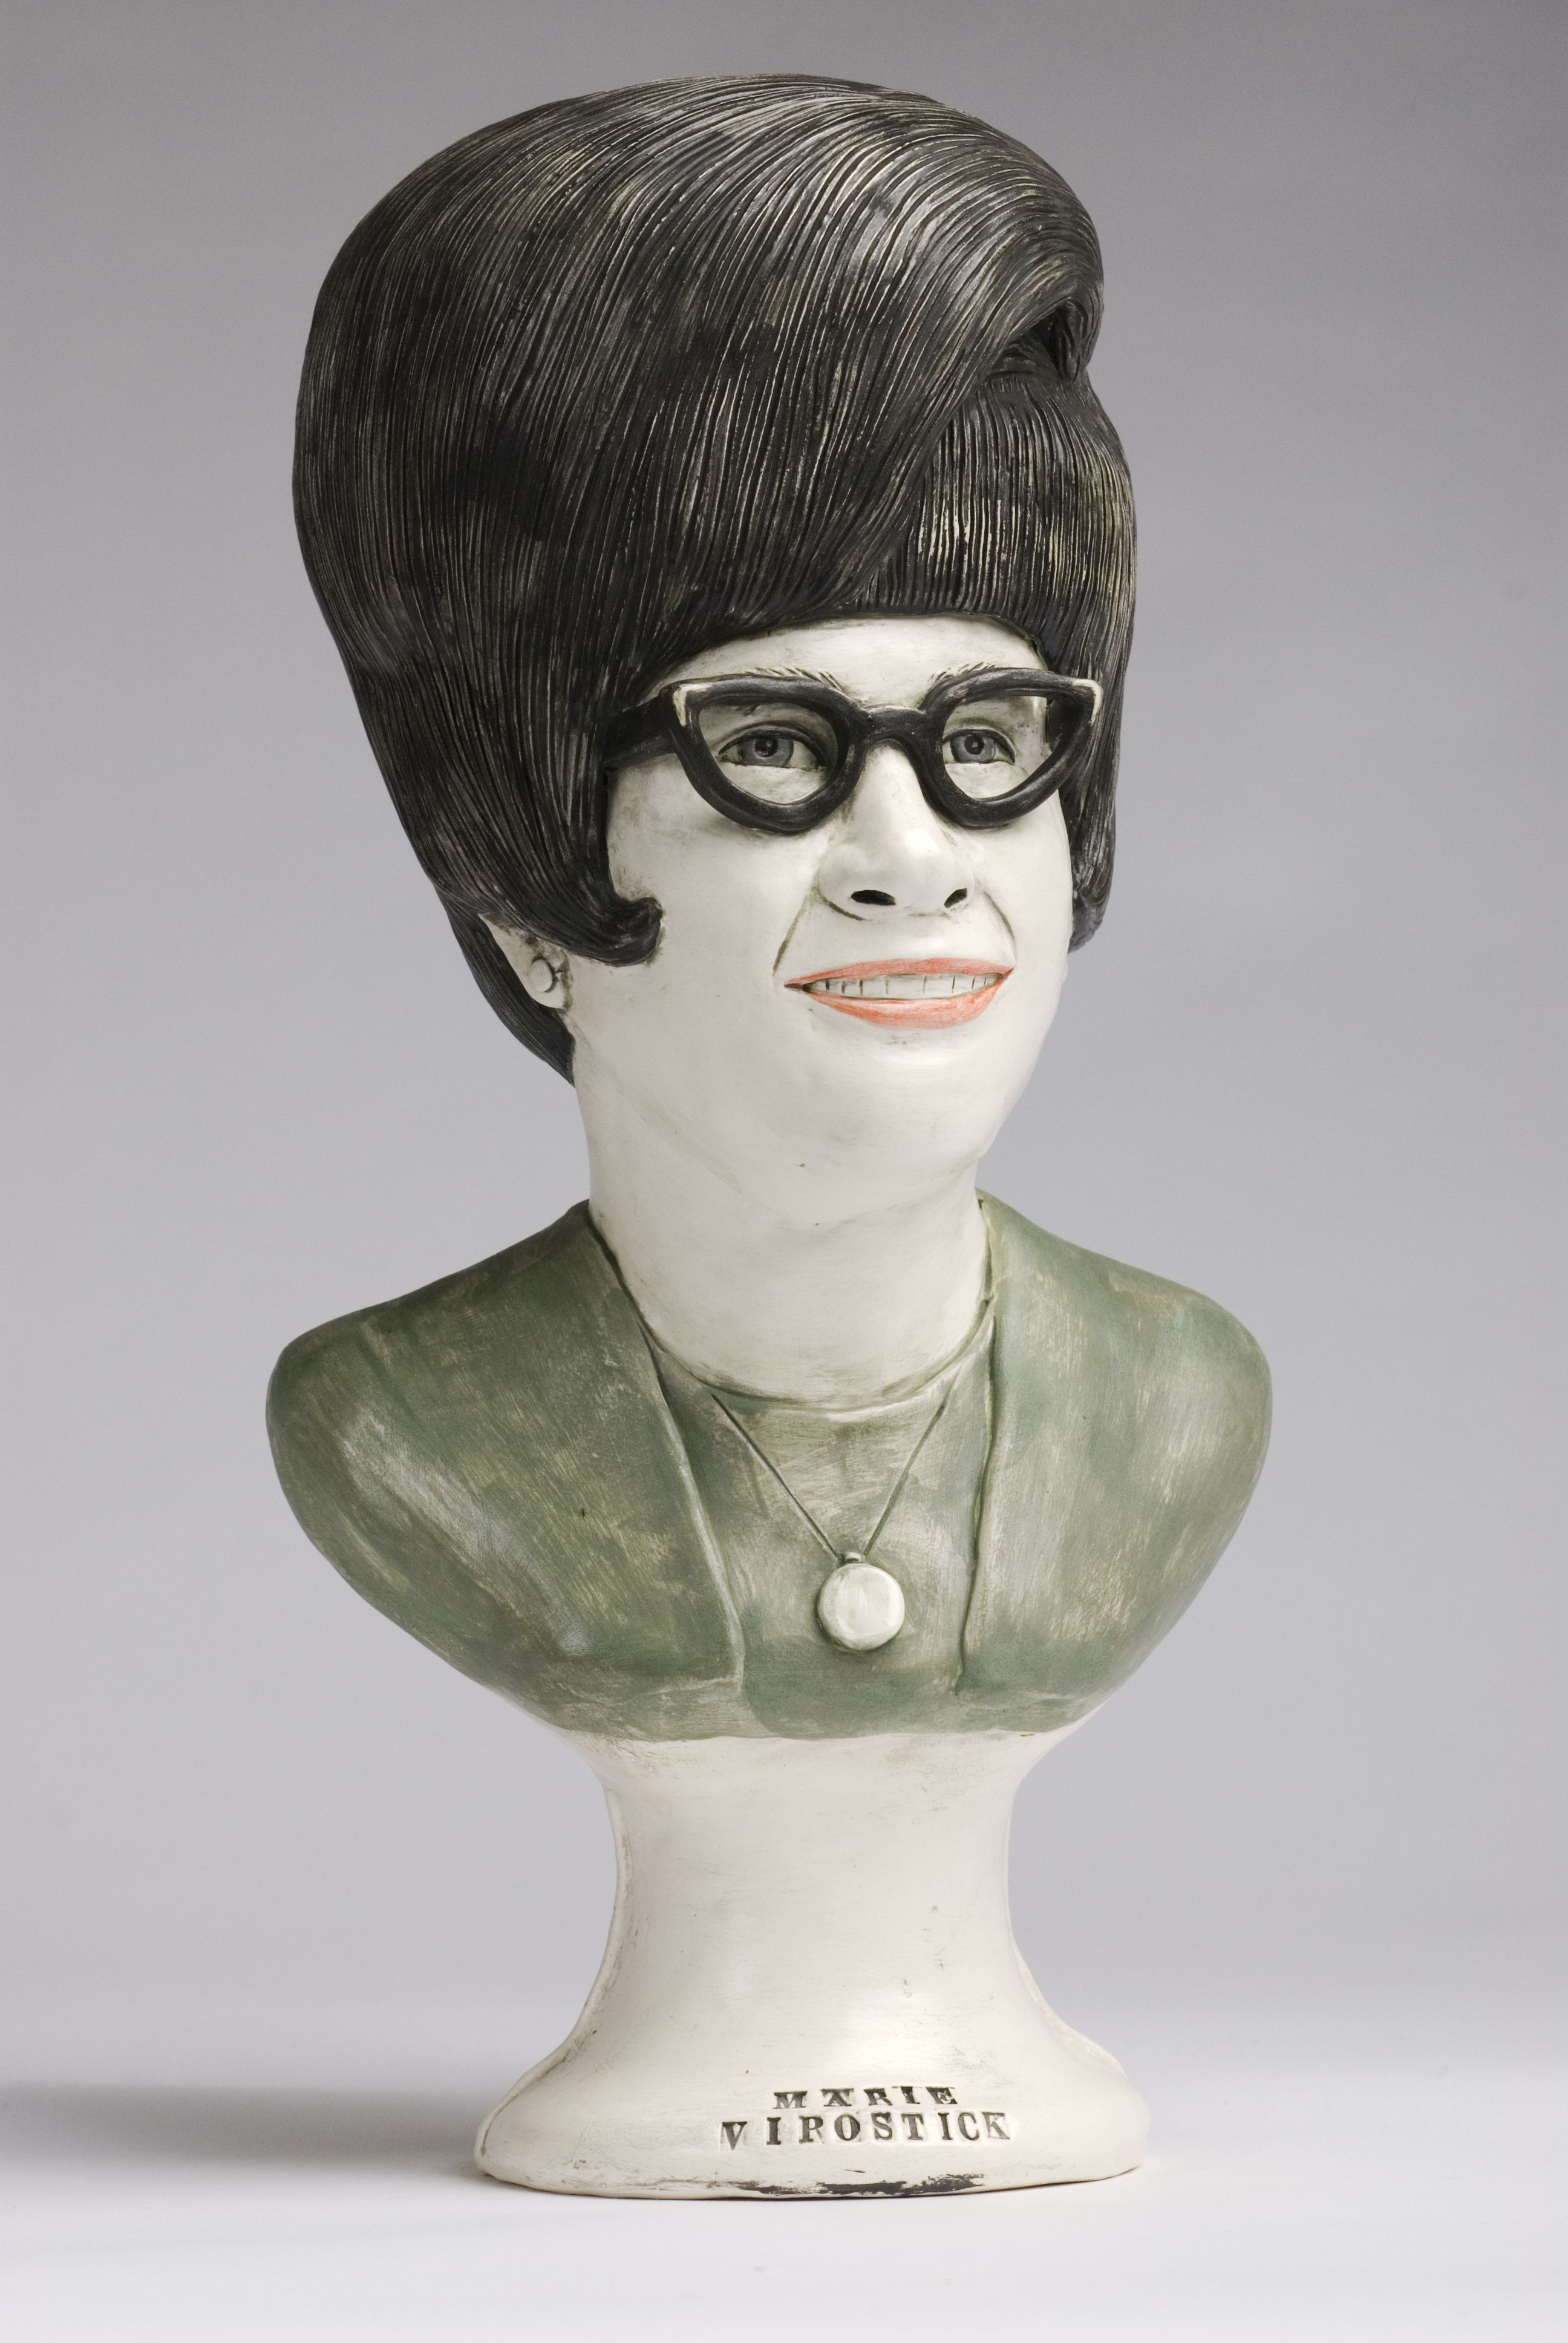 Good Girls - portrait of Marie Virostick - Marilyn Lysohir